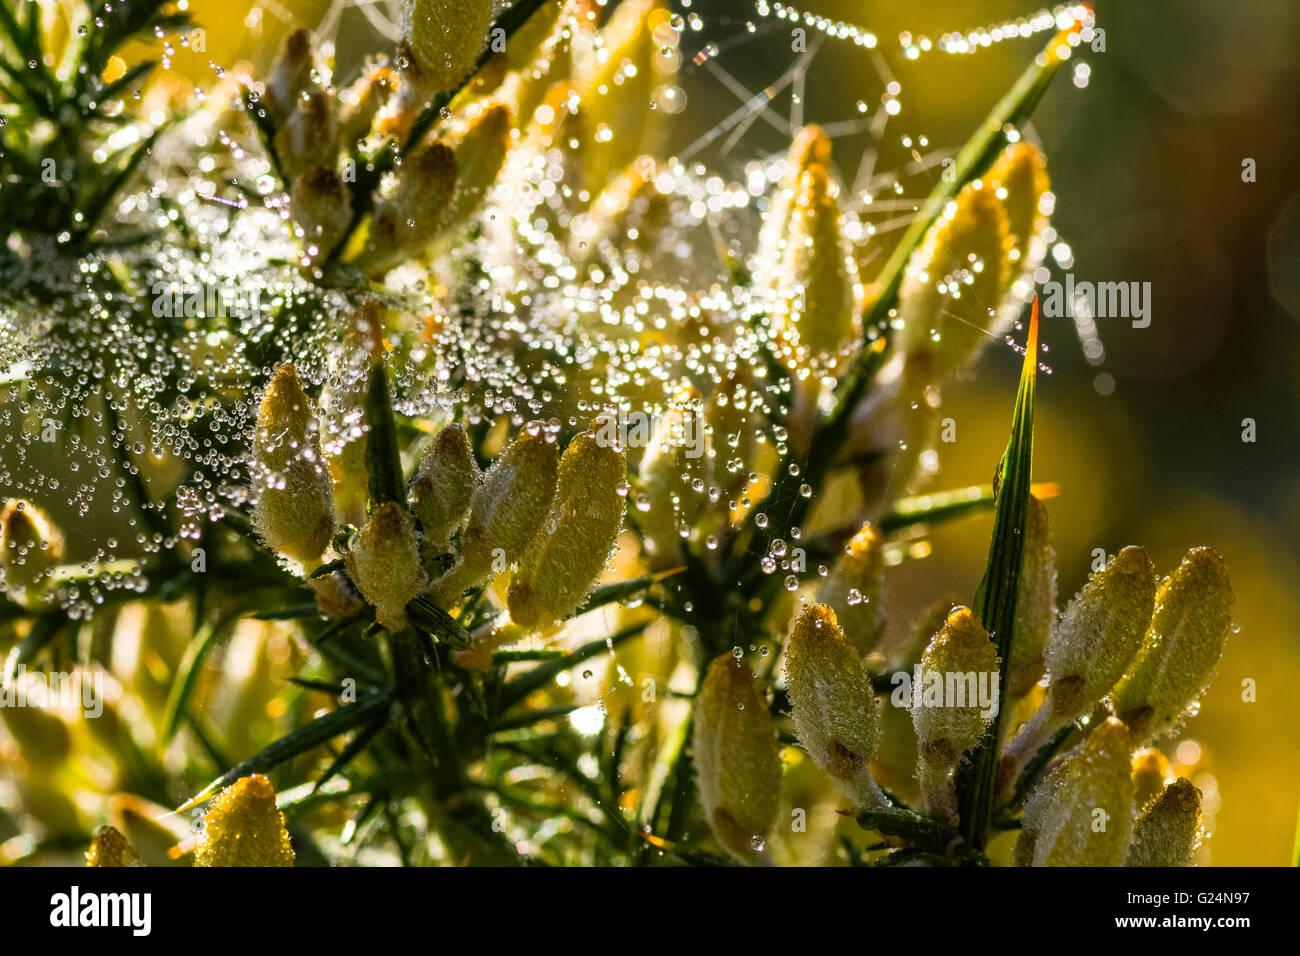 dew on flowers